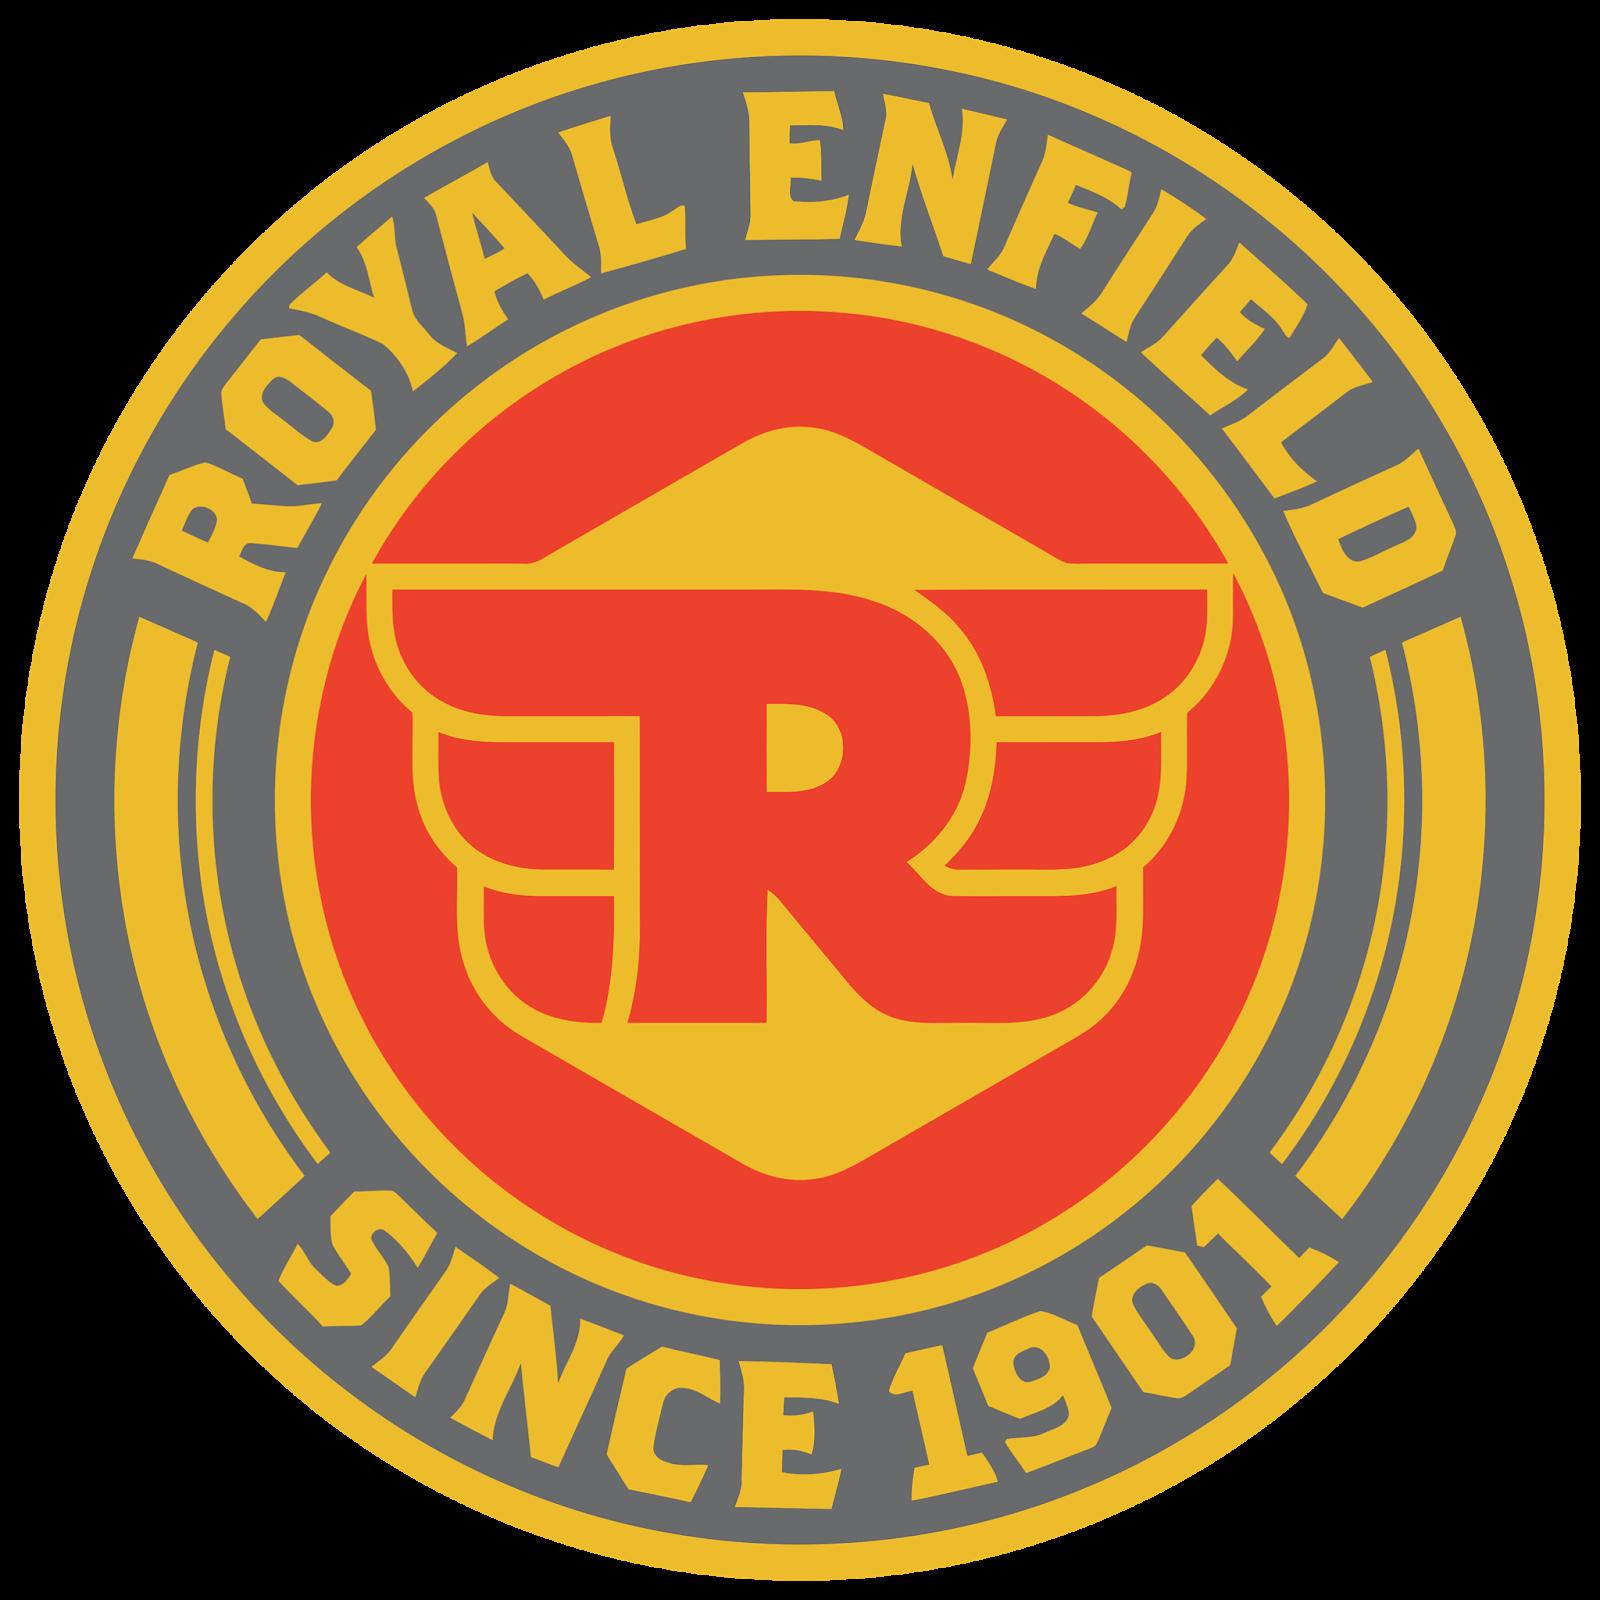 Royal enfield logo royal enfield bullet enfield bike enfield motorcycle bullet tattoo